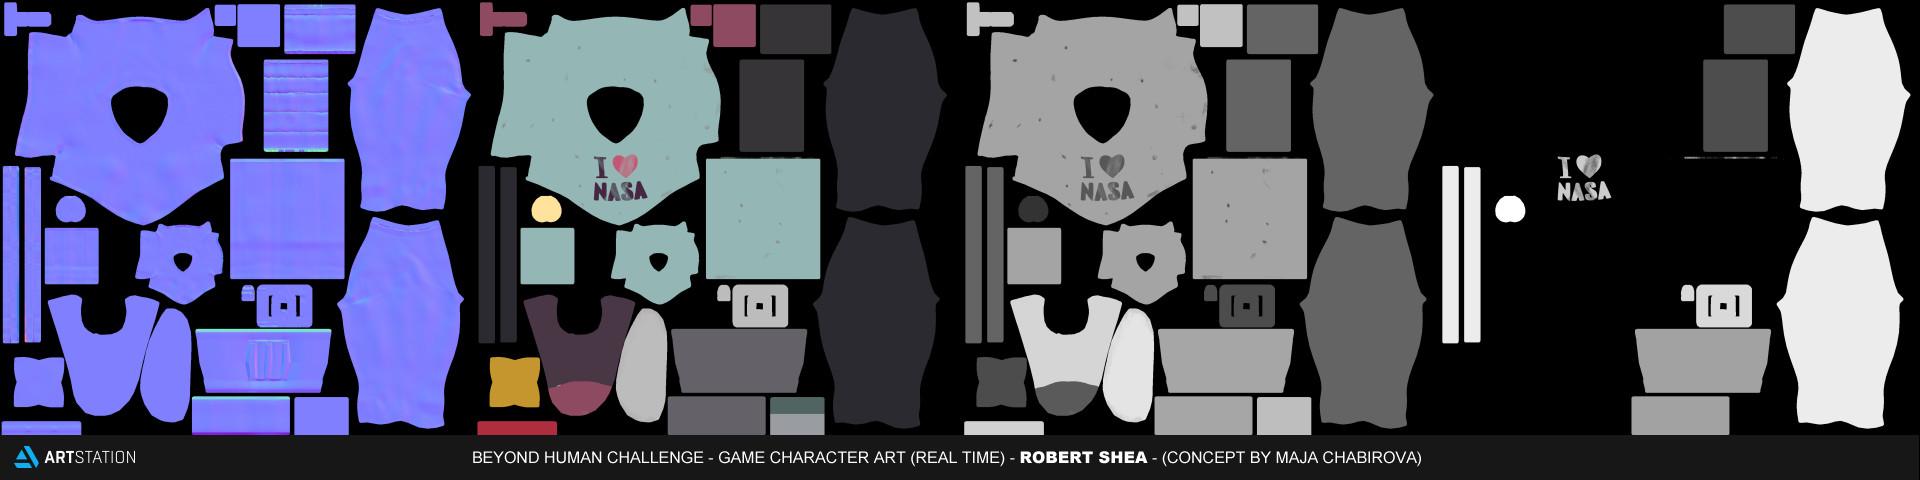 Robert shea clothestextures